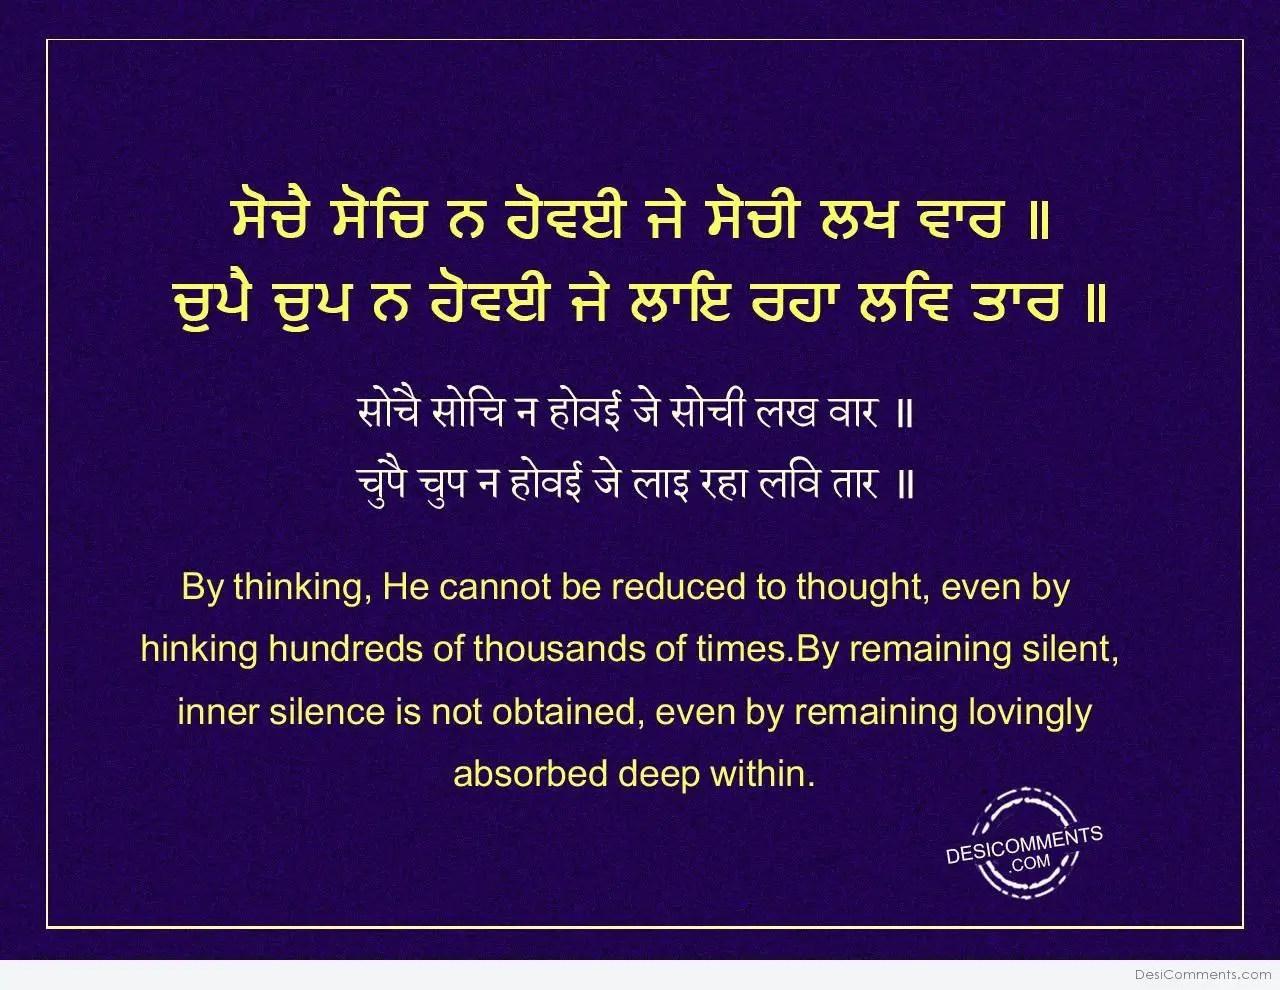 Desi Punjabi Wallpapers Quotes Gurbani Pictures Images Graphics